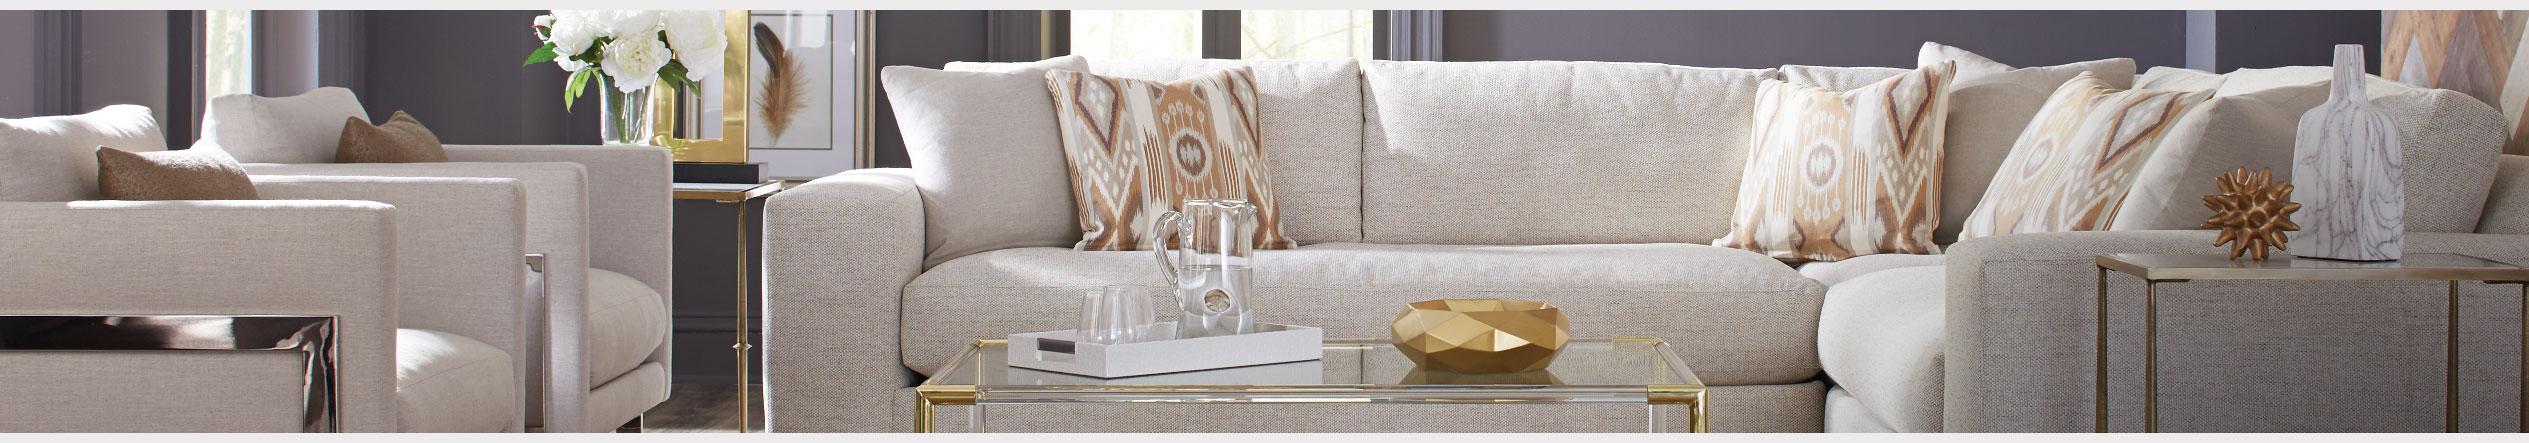 Transaction Policies at Jordan's Furniture